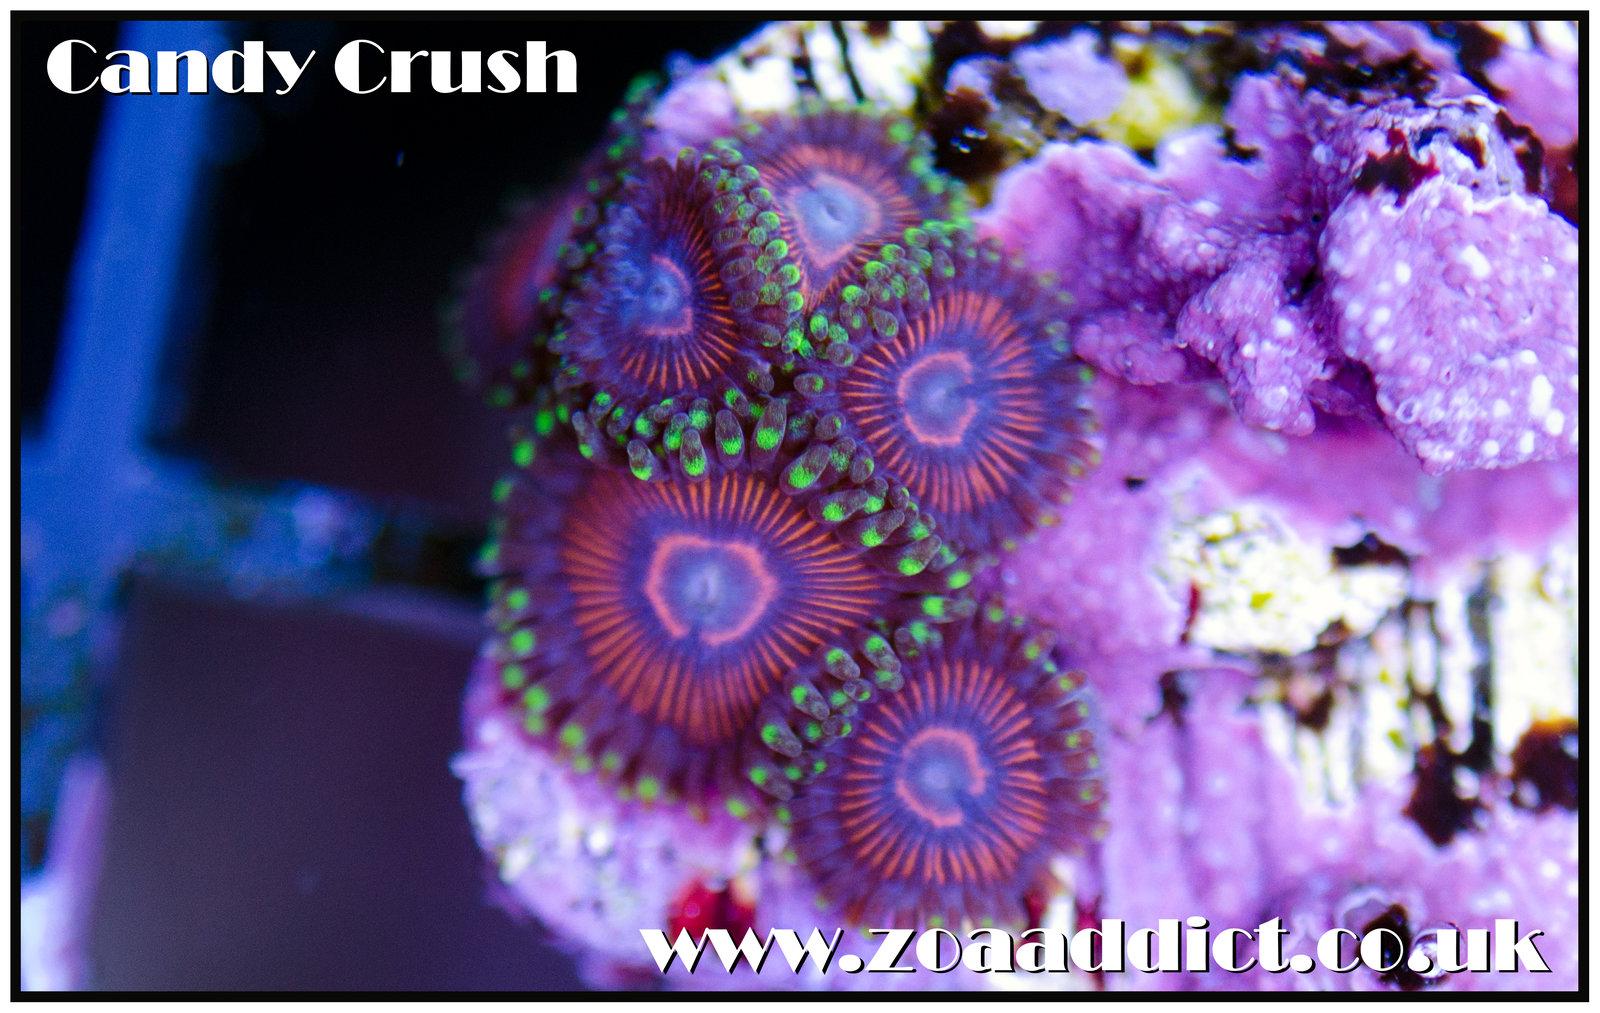 candy crush.